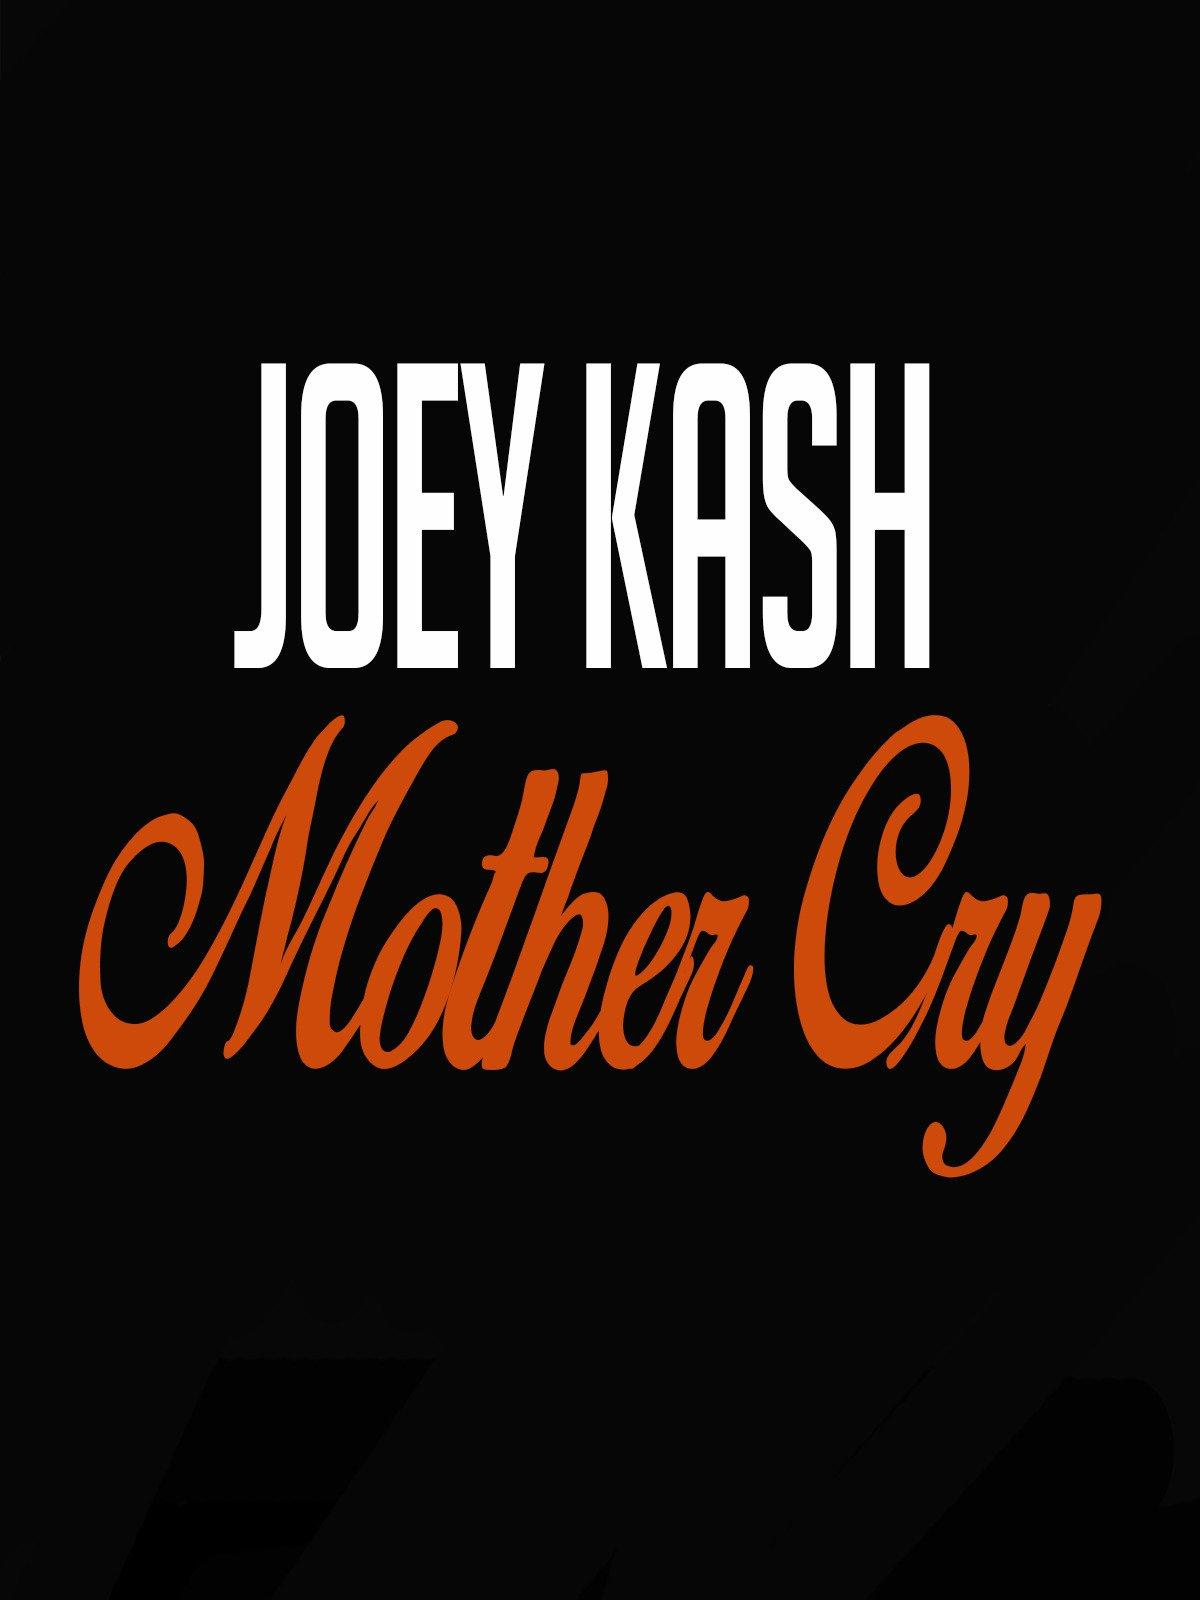 Joey kash